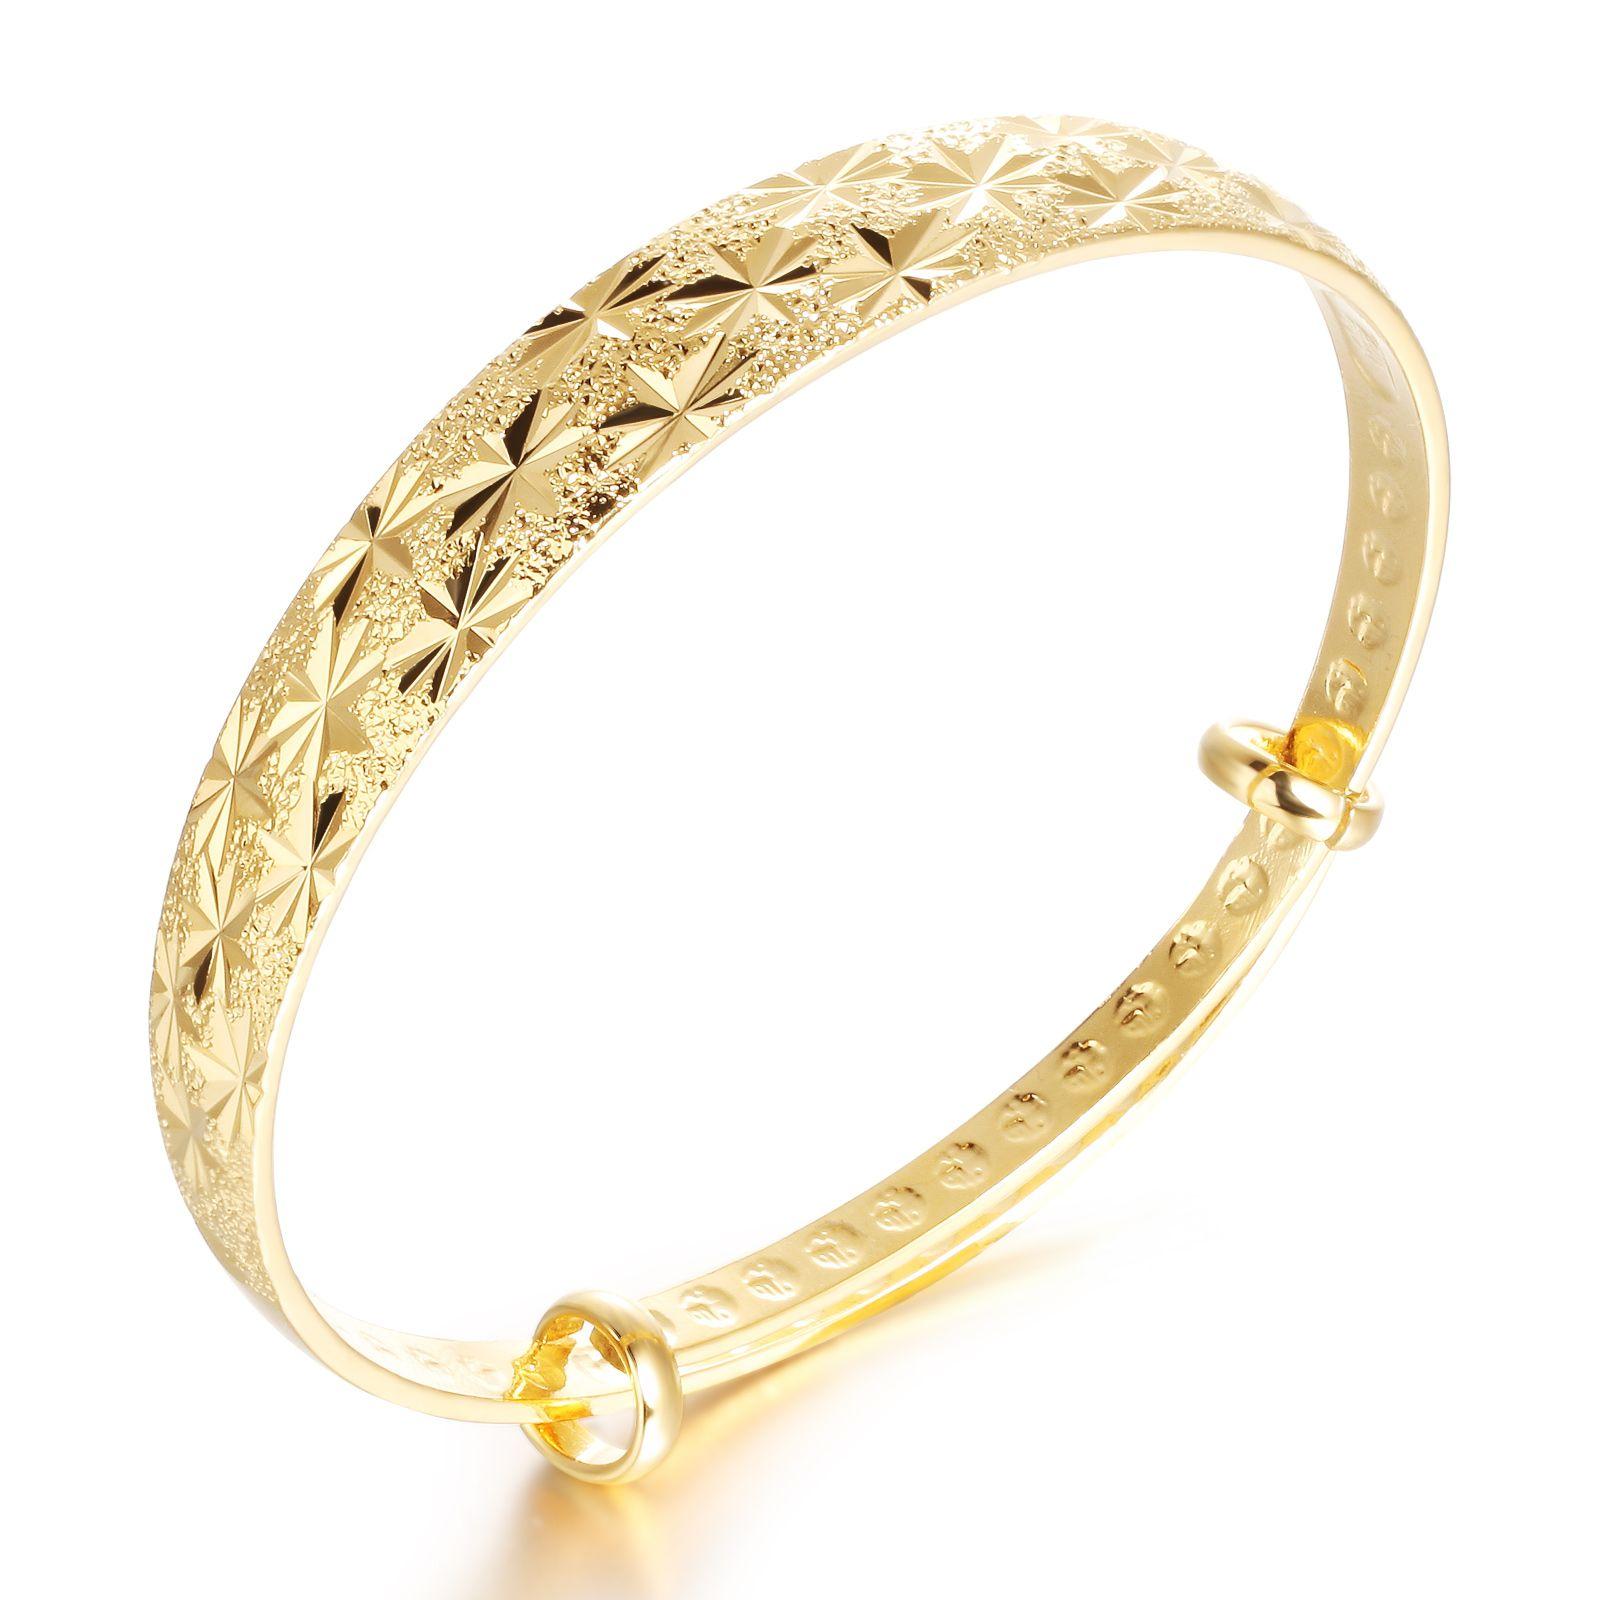 Classical 18k Yellow Gold Diamond-Cut Bangle Bracelet High Polish Metal Finish Adjustable,Wedding accessories